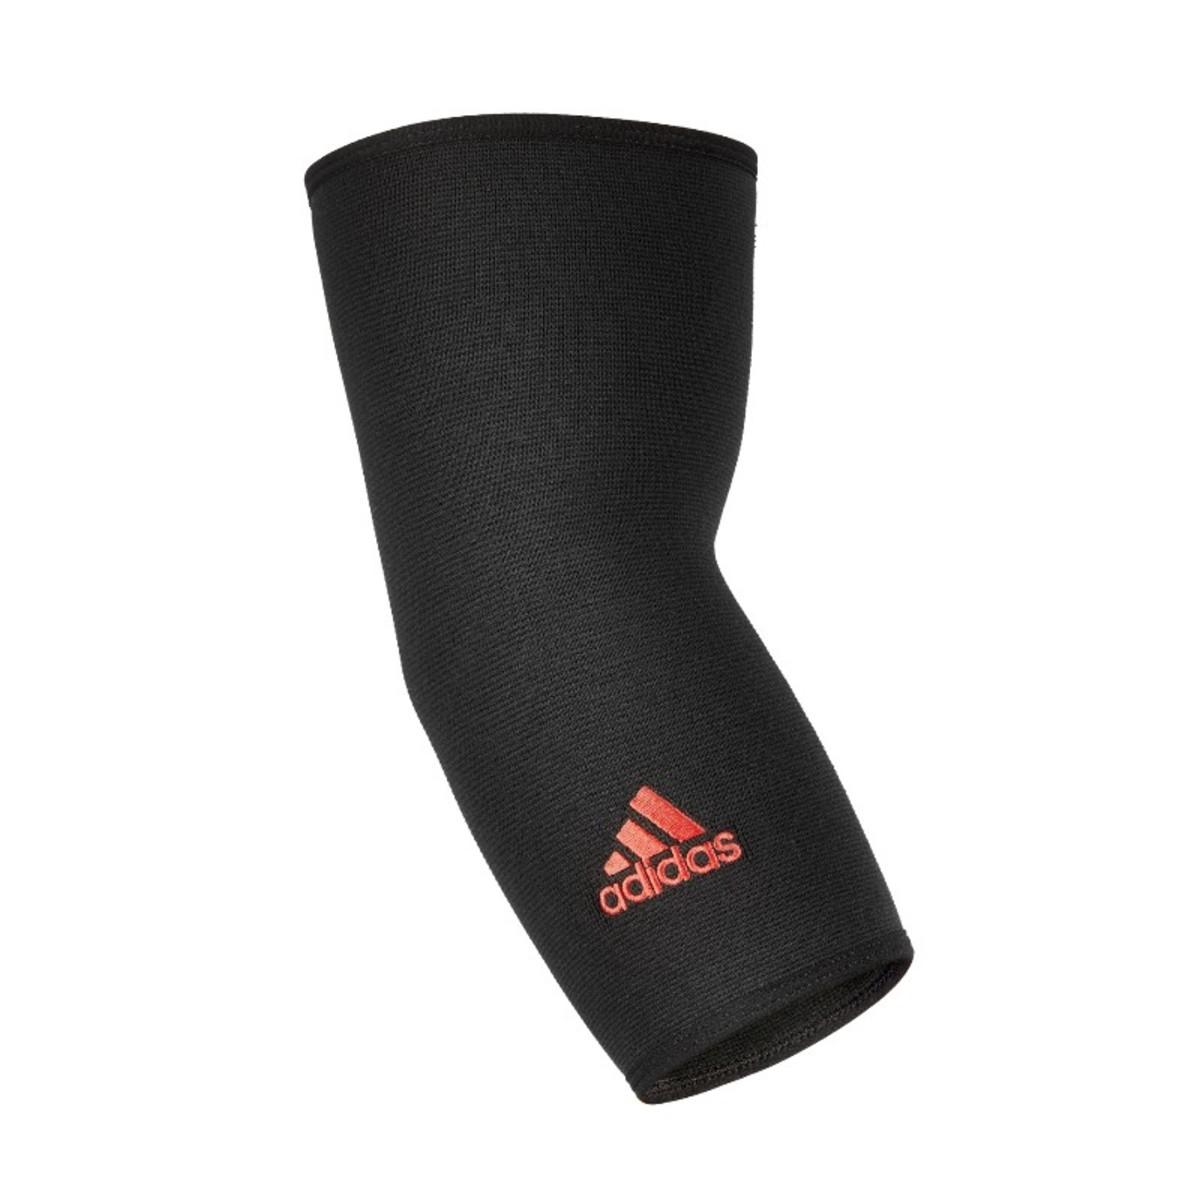 Adidas 護肘(S碼)(細碼)